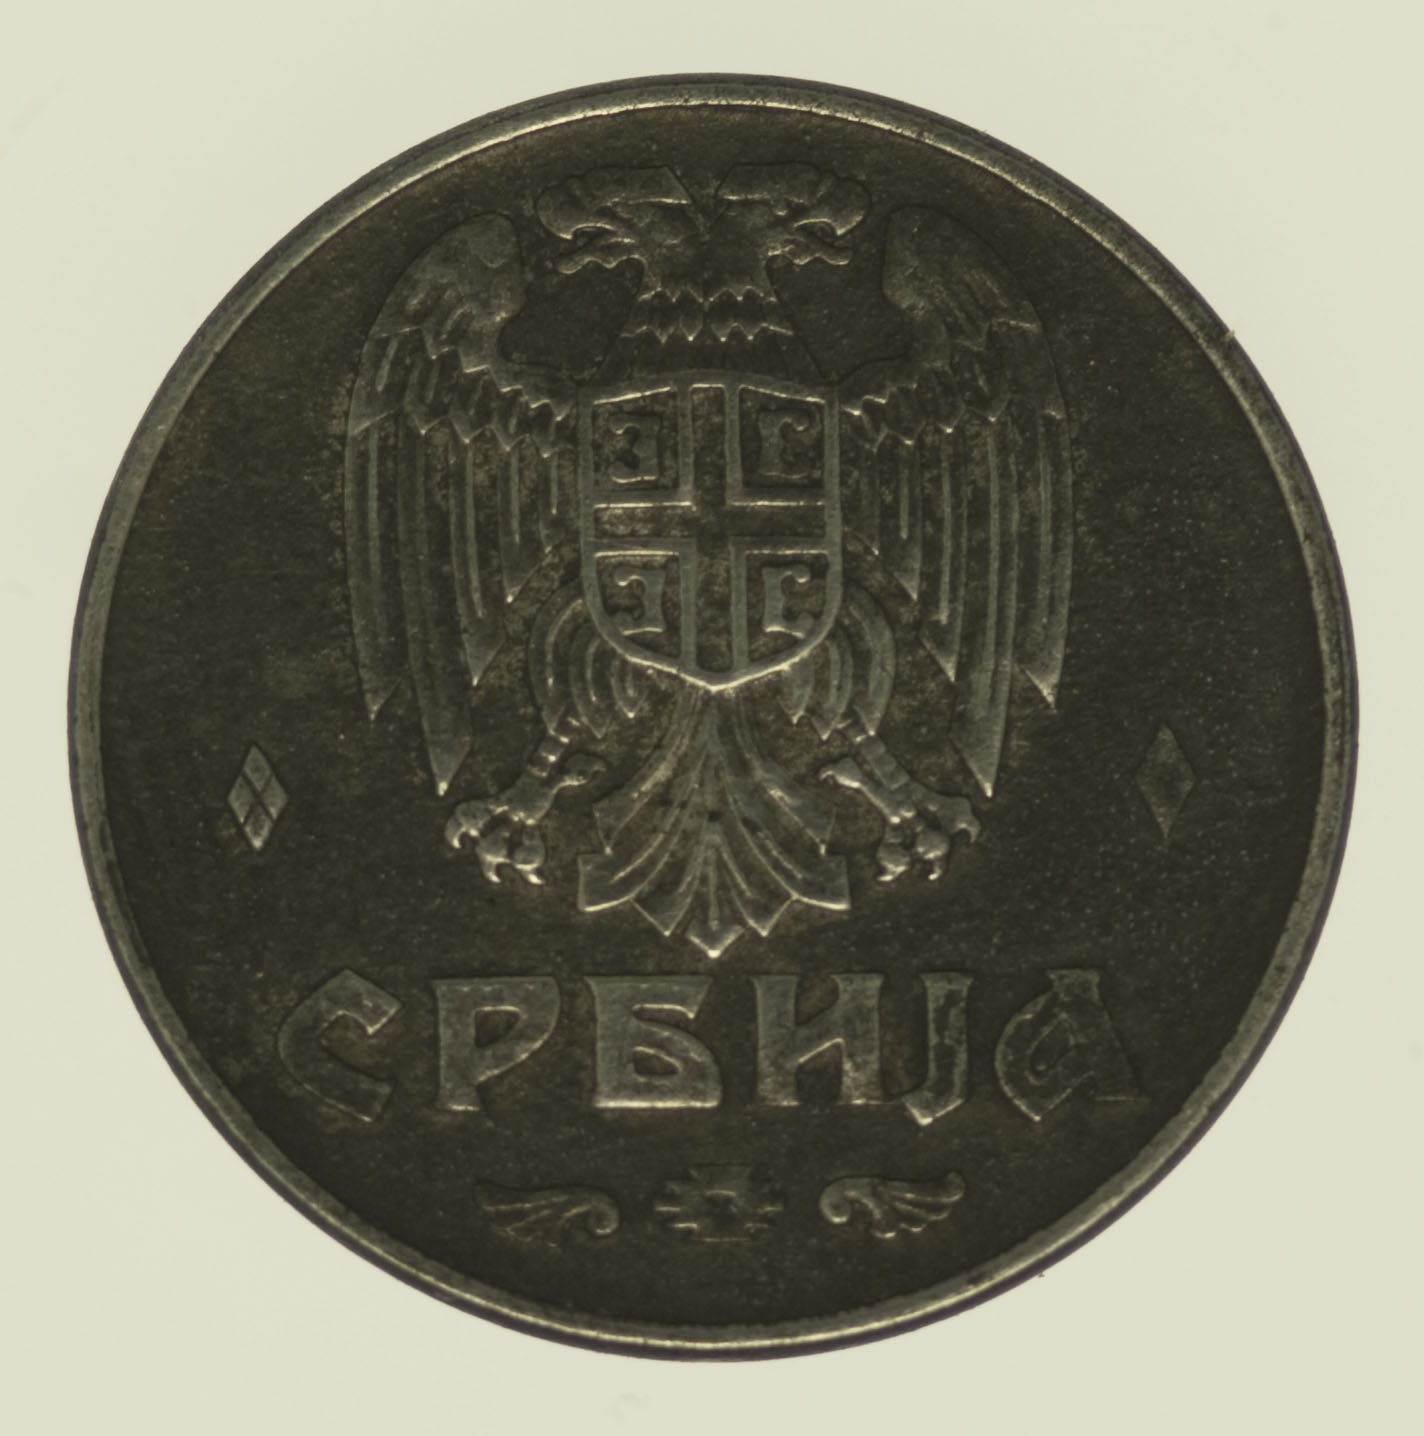 serbien-silbermuenzen-uebriges-europa - Serbien 1 Dinar 1942